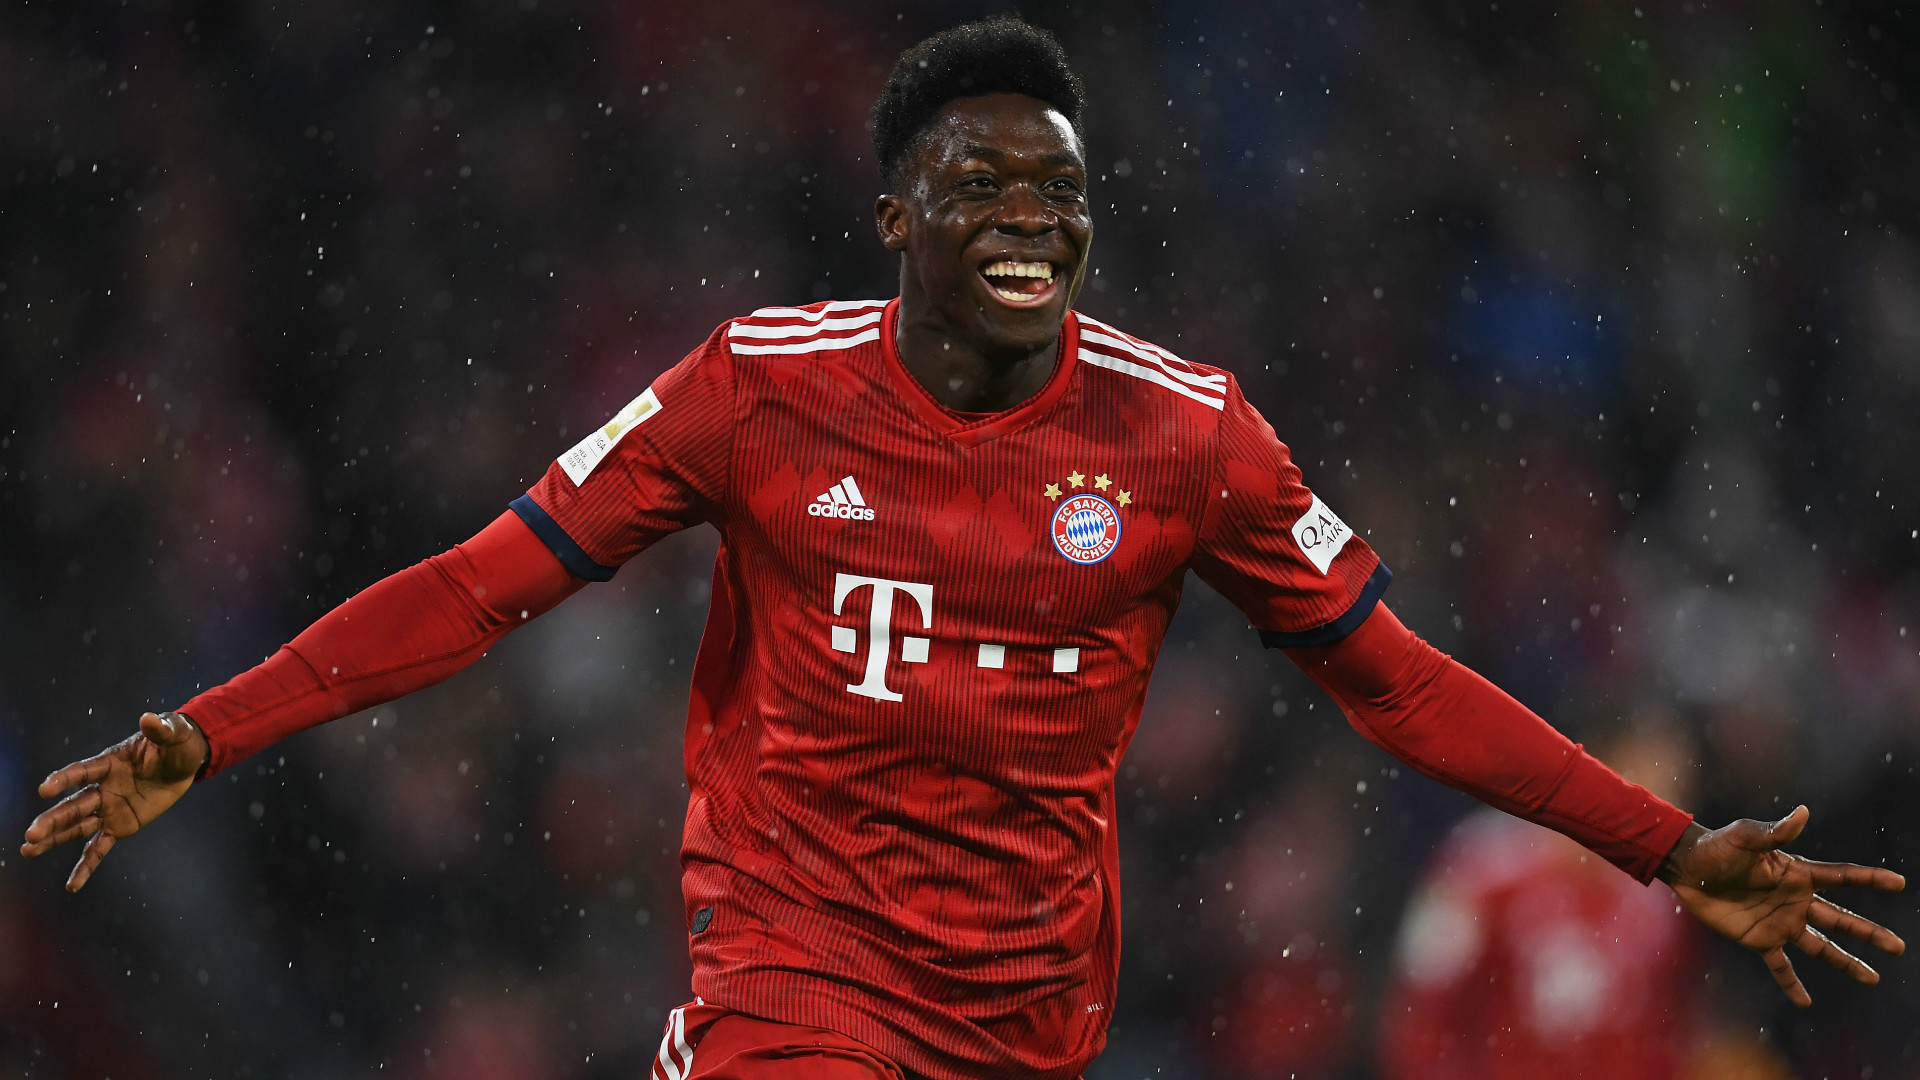 How to watch Alphonso Davies, Bayern Munich in Canada for 2020-21 Bundesliga season